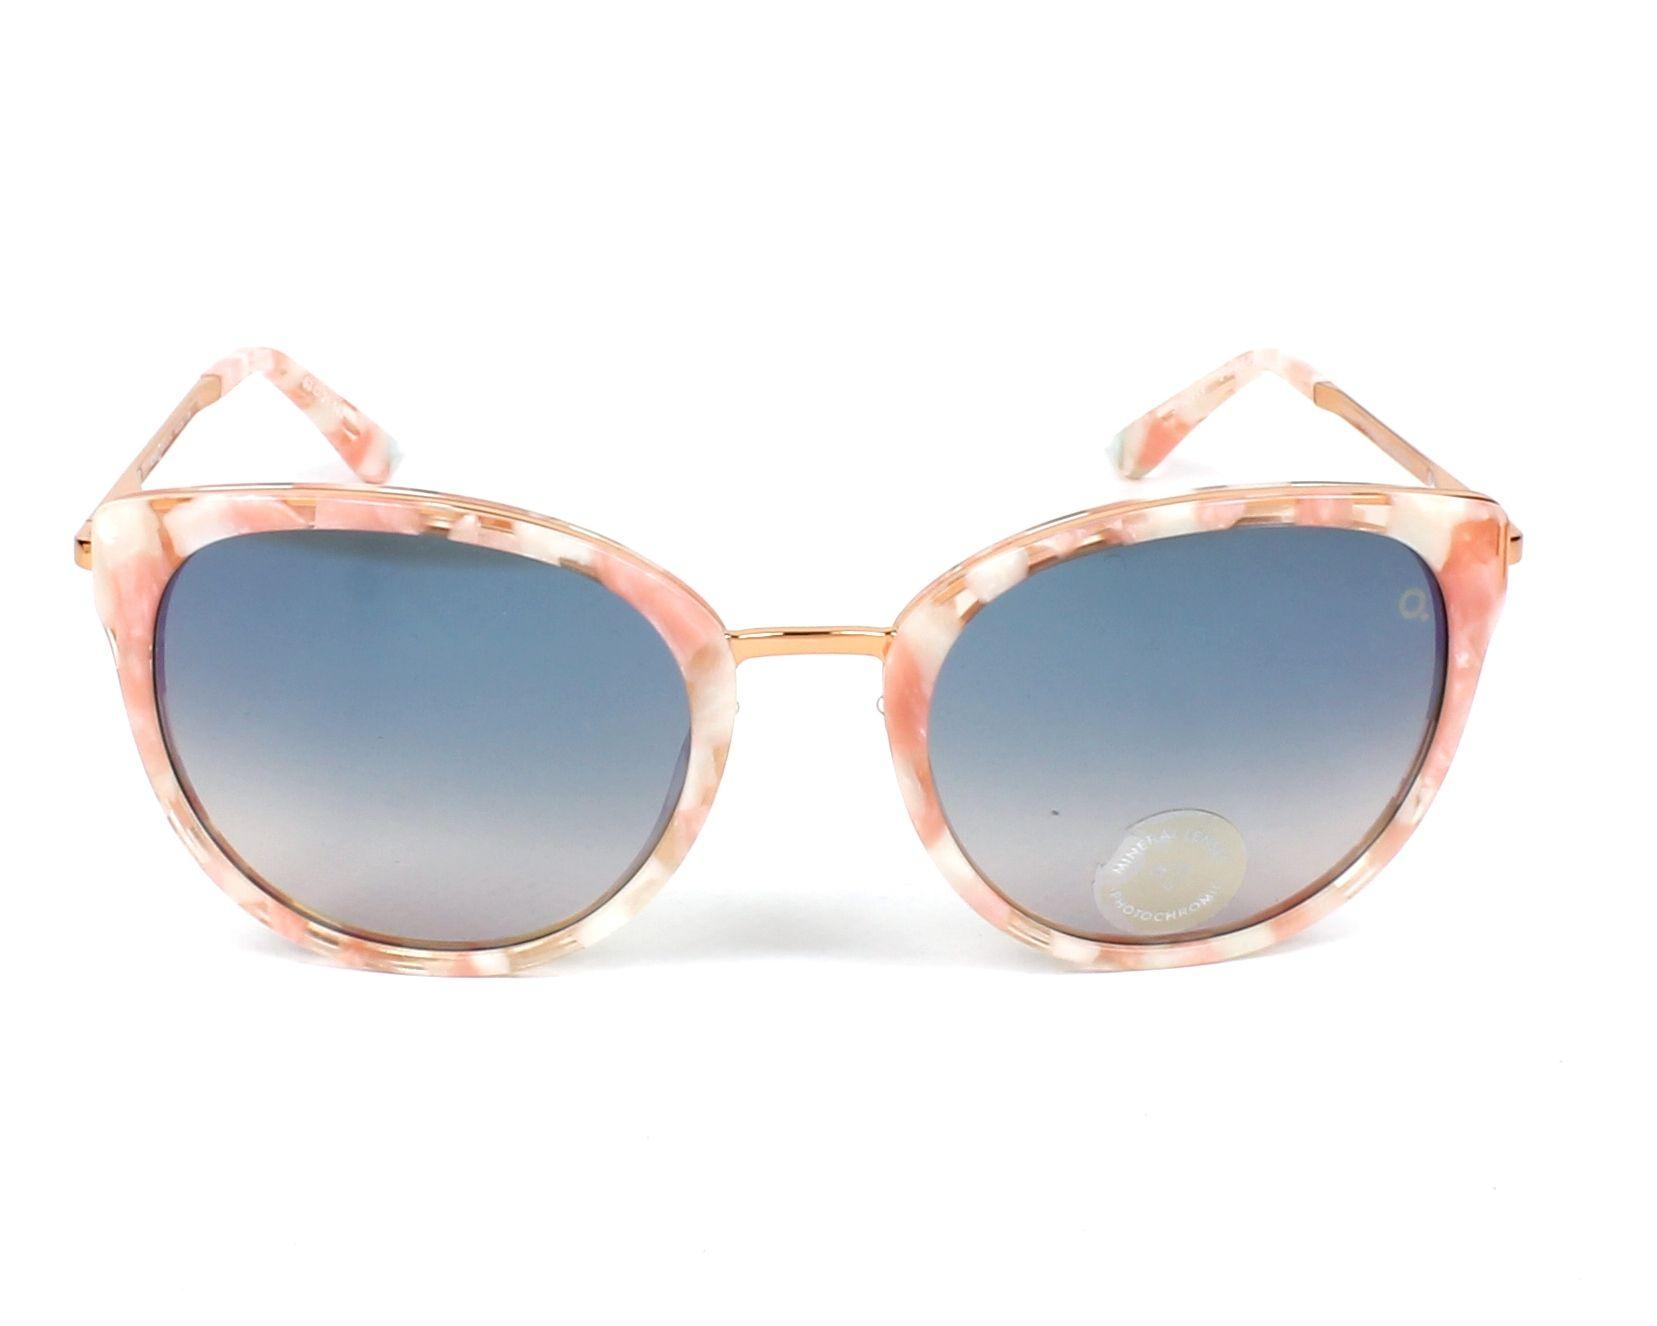 187b07a30f Gafas de sol Etnia Barcelona princesa PKSK - Rosa Oro cobre vista de frente